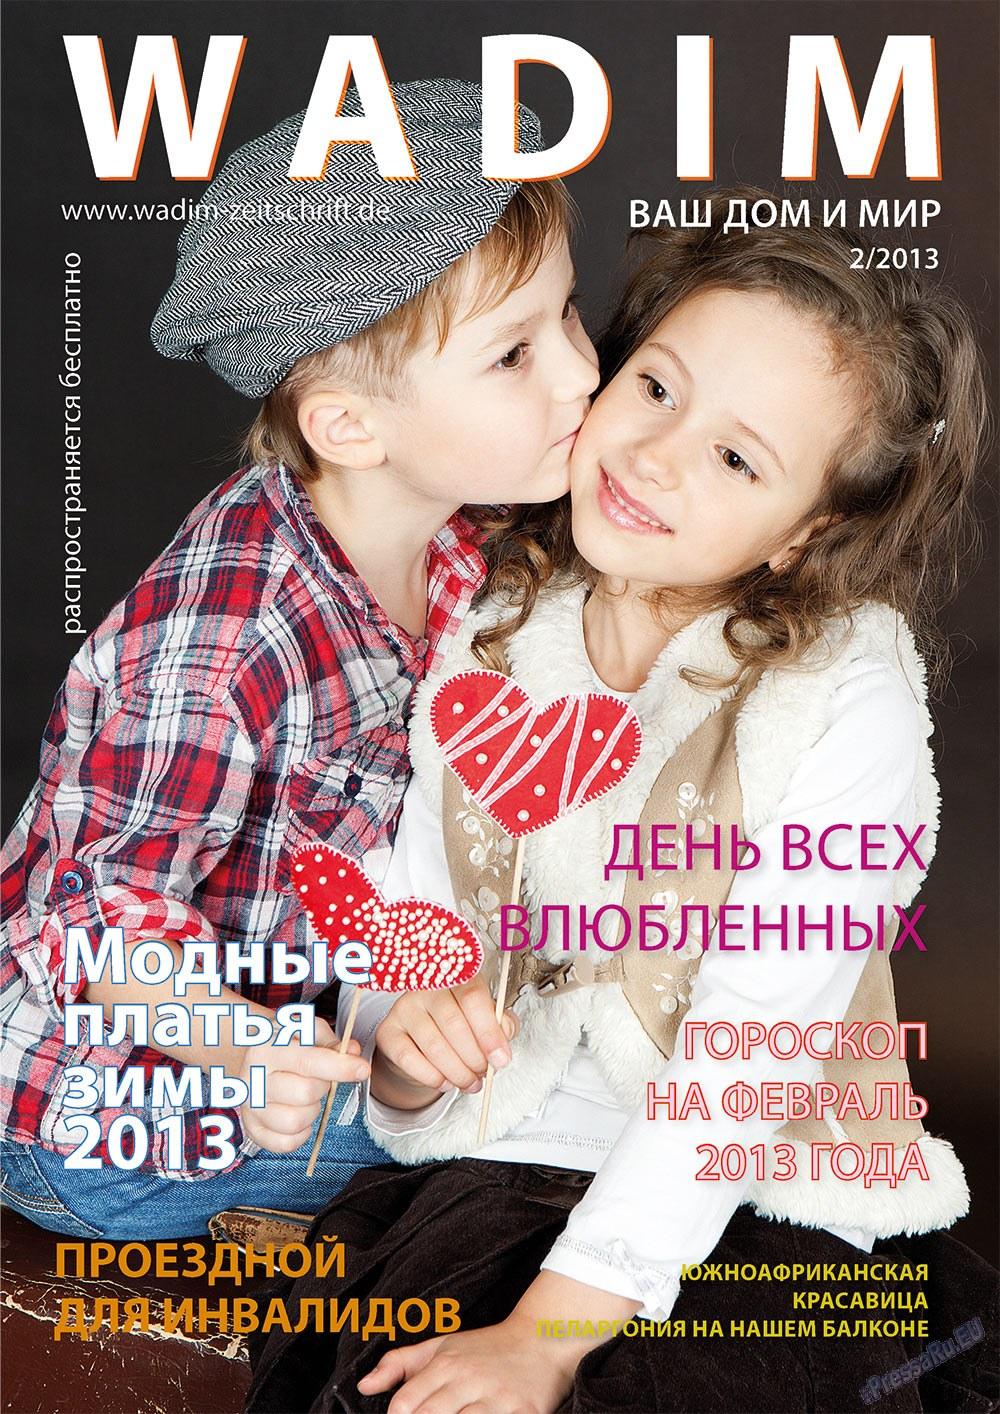 Wadim (журнал). 2013 год, номер 2, стр. 1